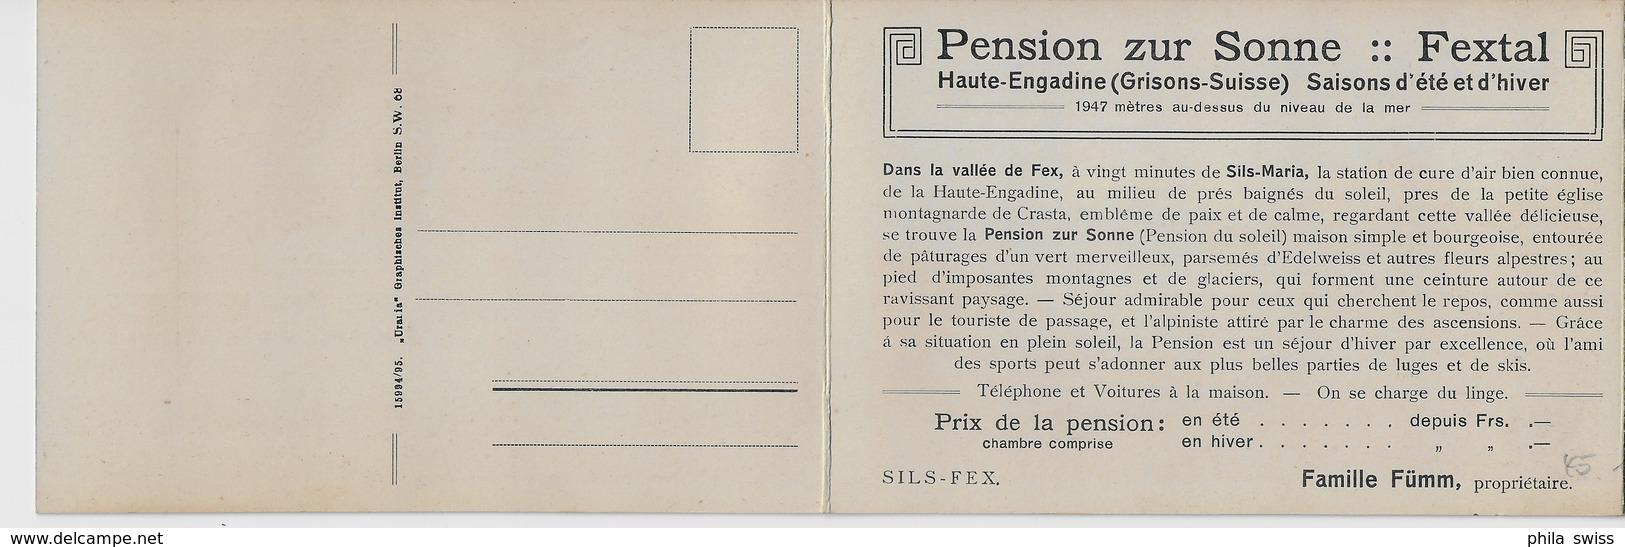 Pension Zur Sonne, Fextal, Engadin - Kirchlein - Doppelkarte - GR Grisons